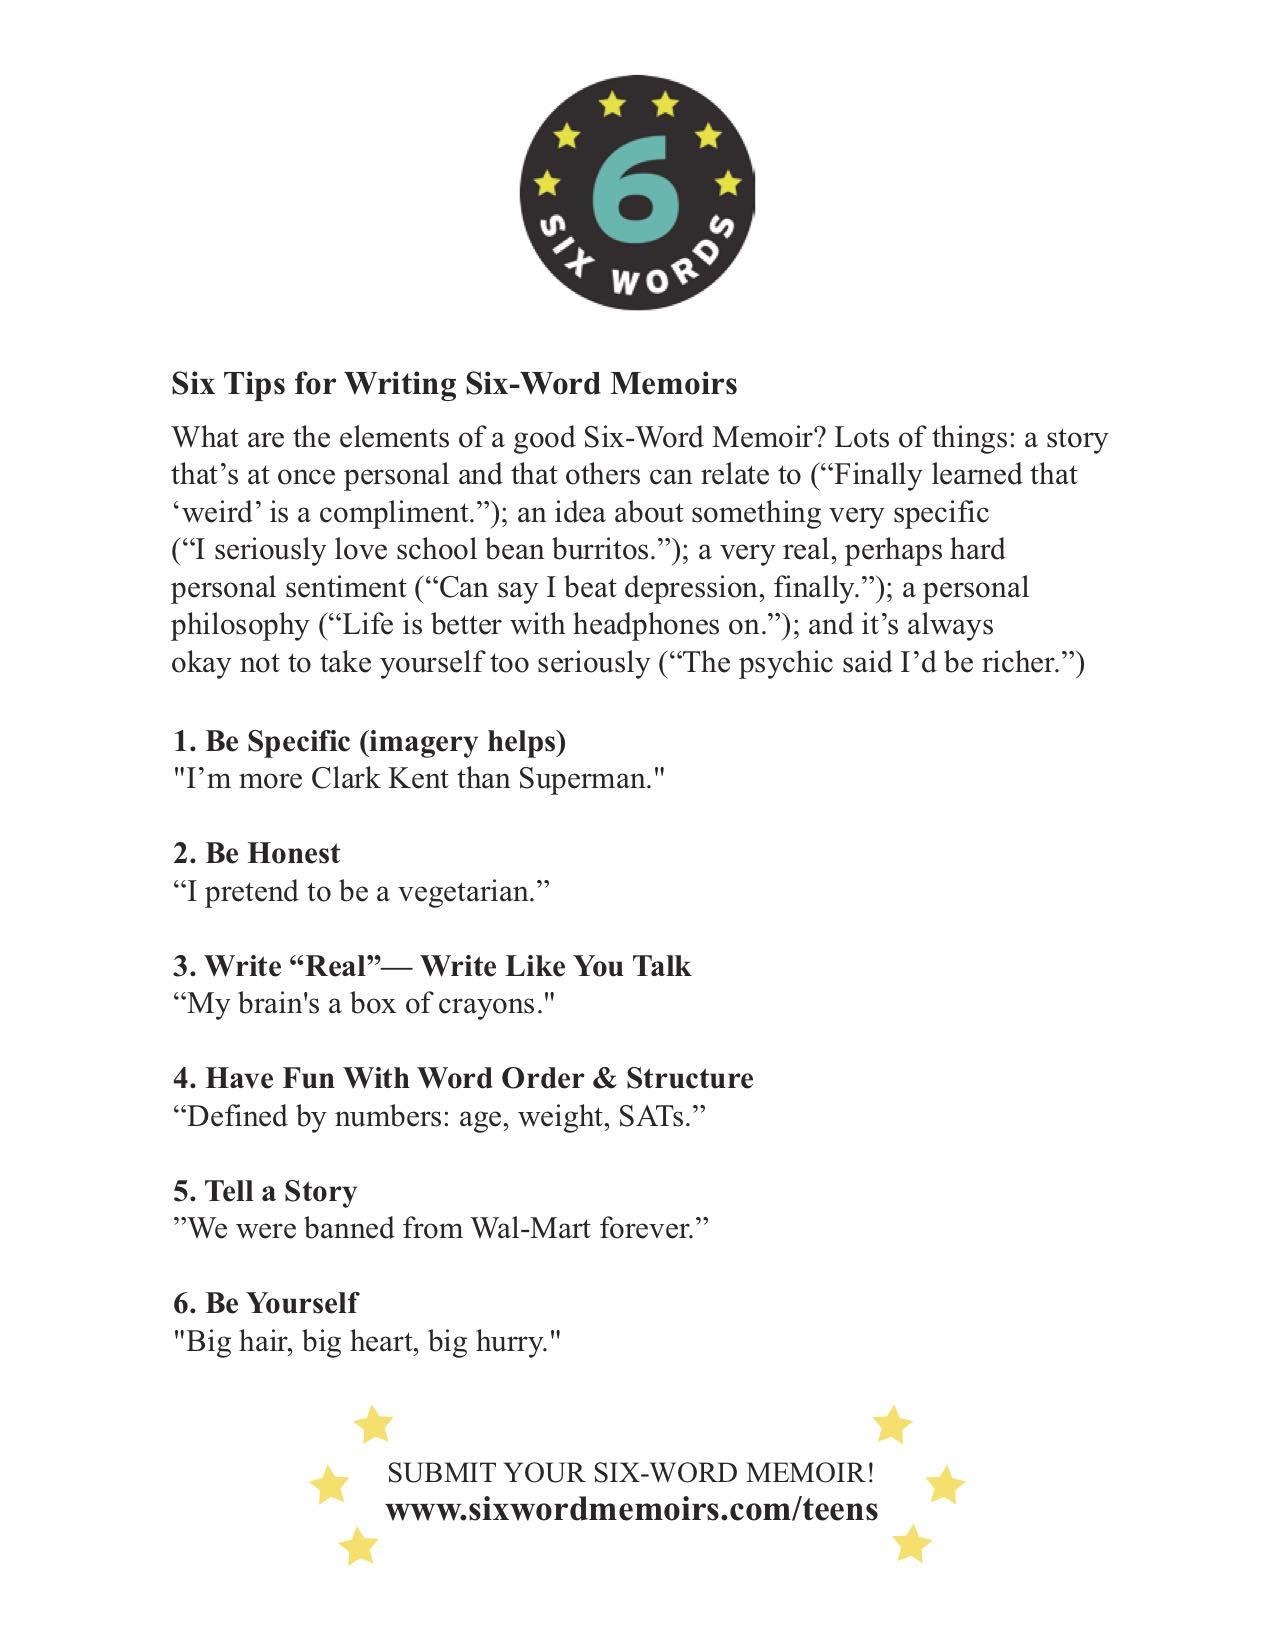 Six Tips for Writing Six-Word Memoirs - teens.jpg